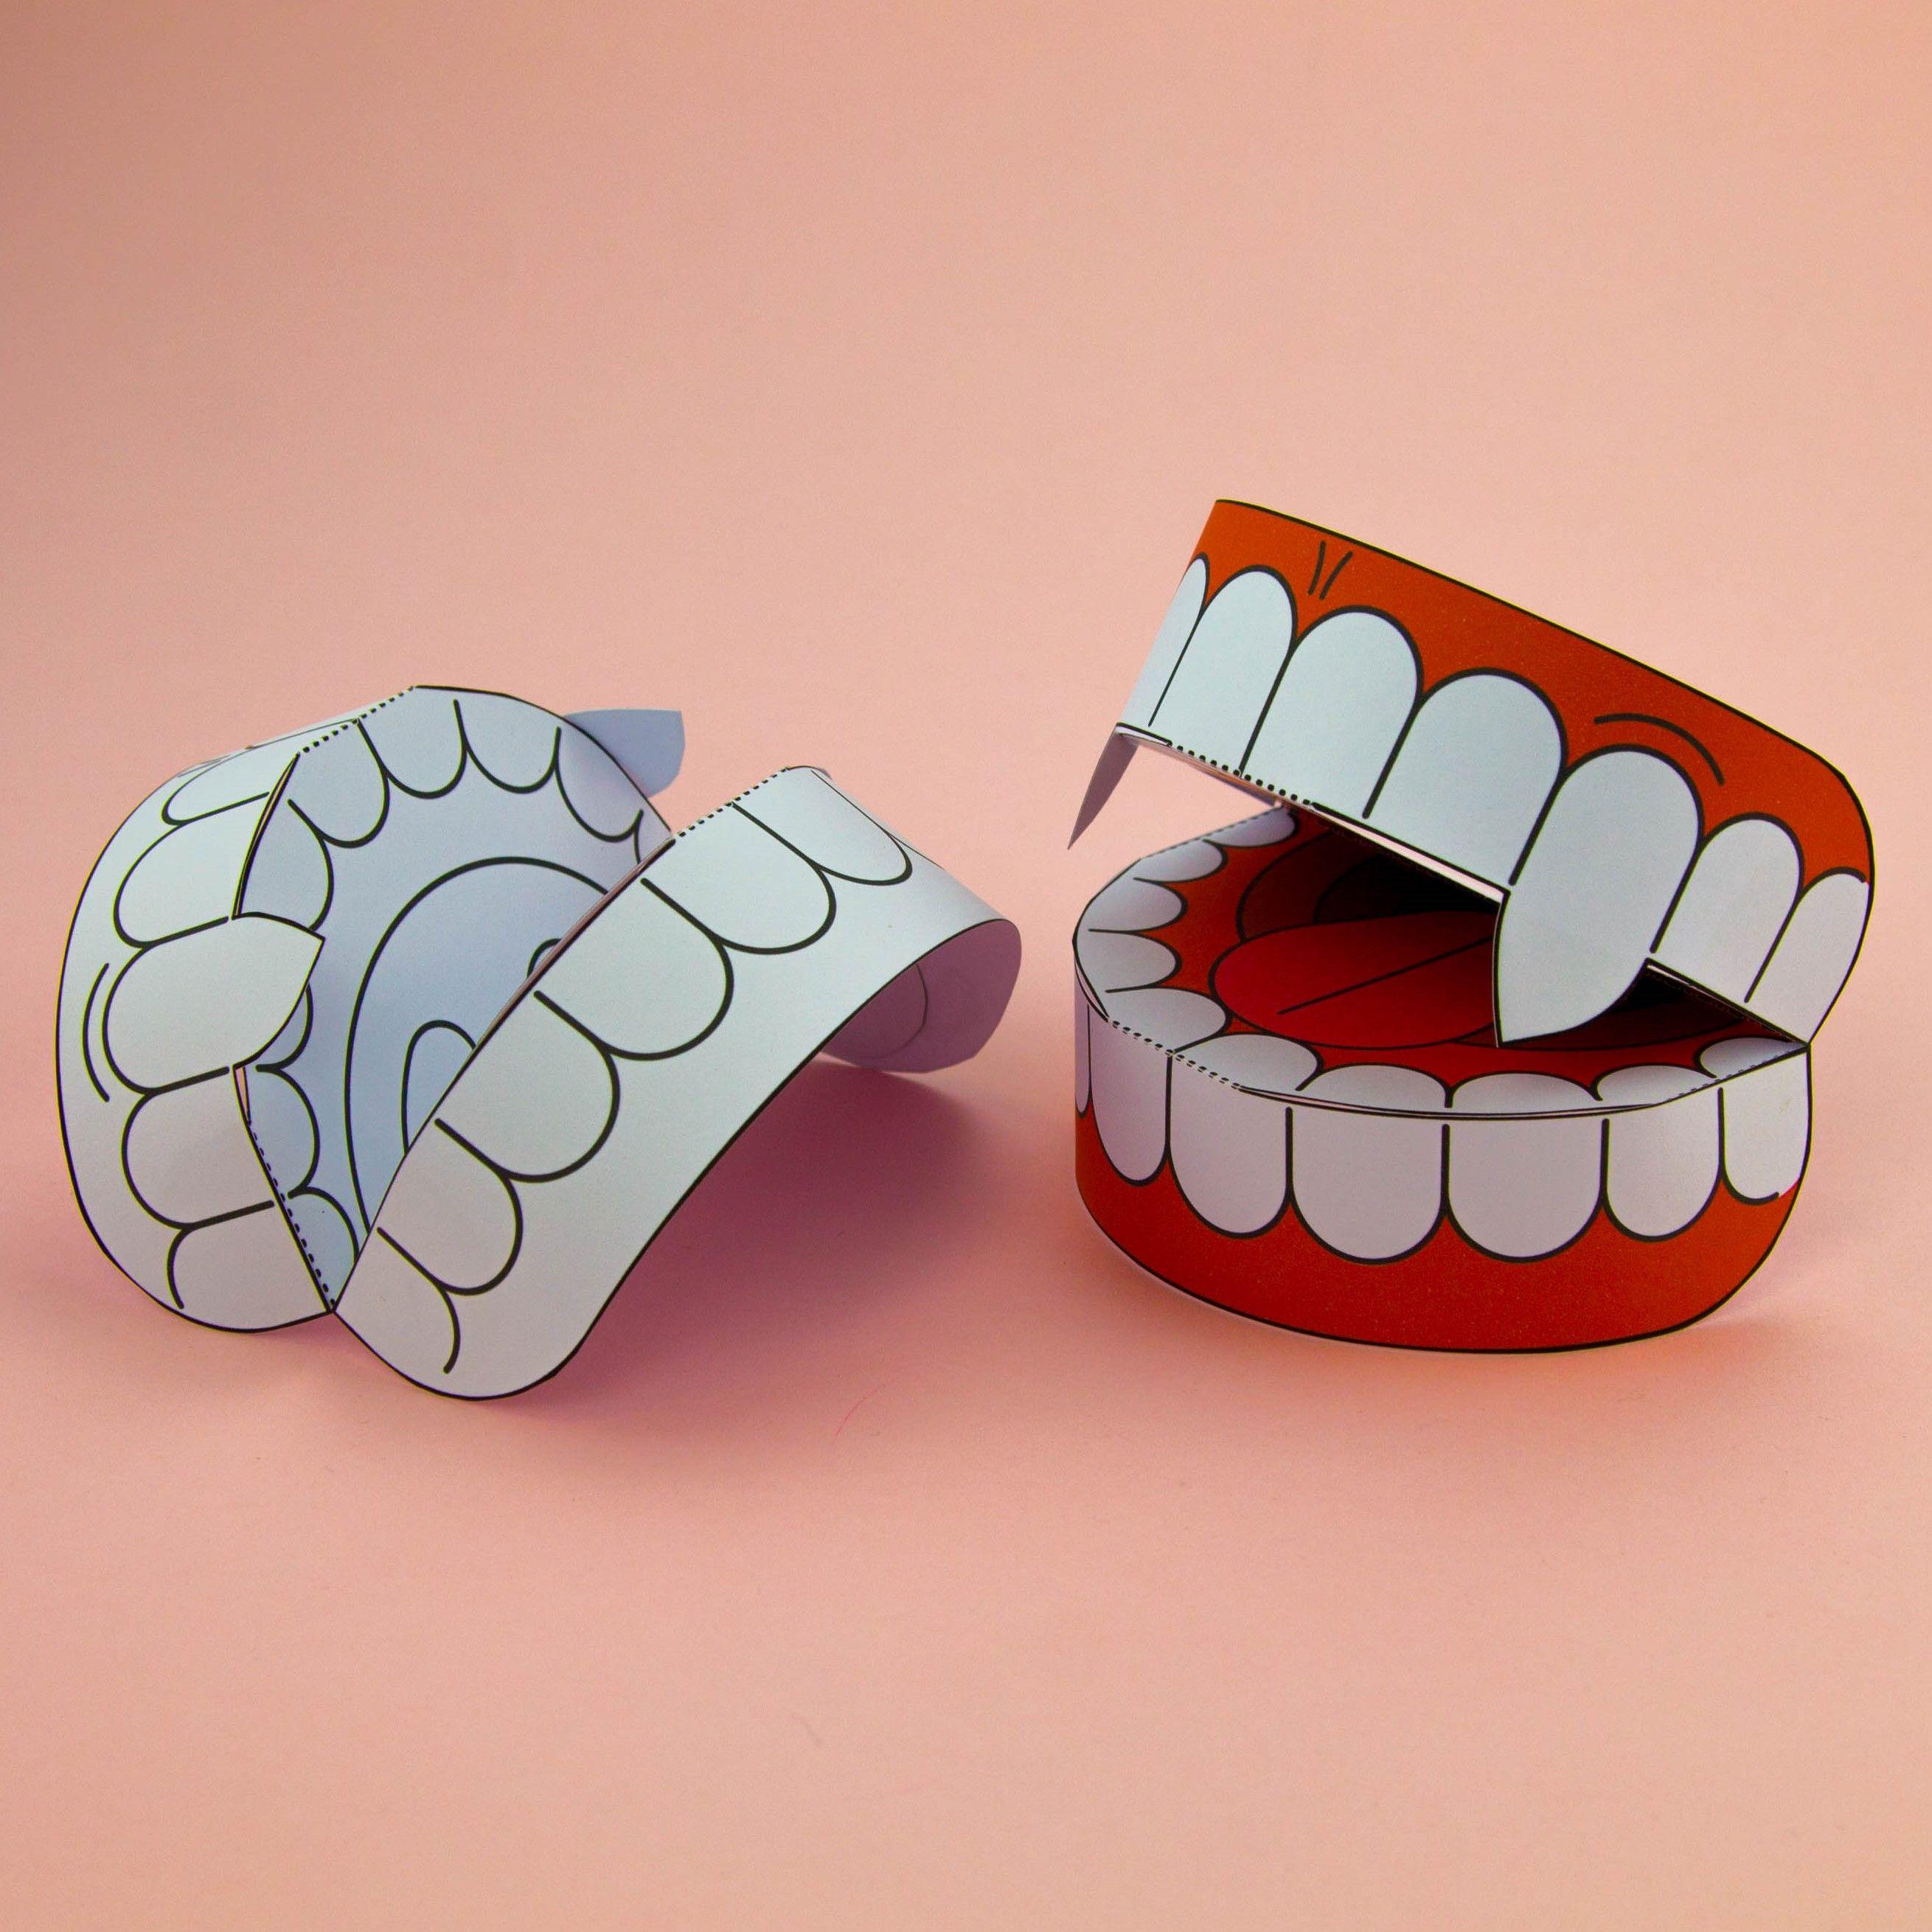 Simple 3d Halloween Vampire Teeth Activity Paper Craft